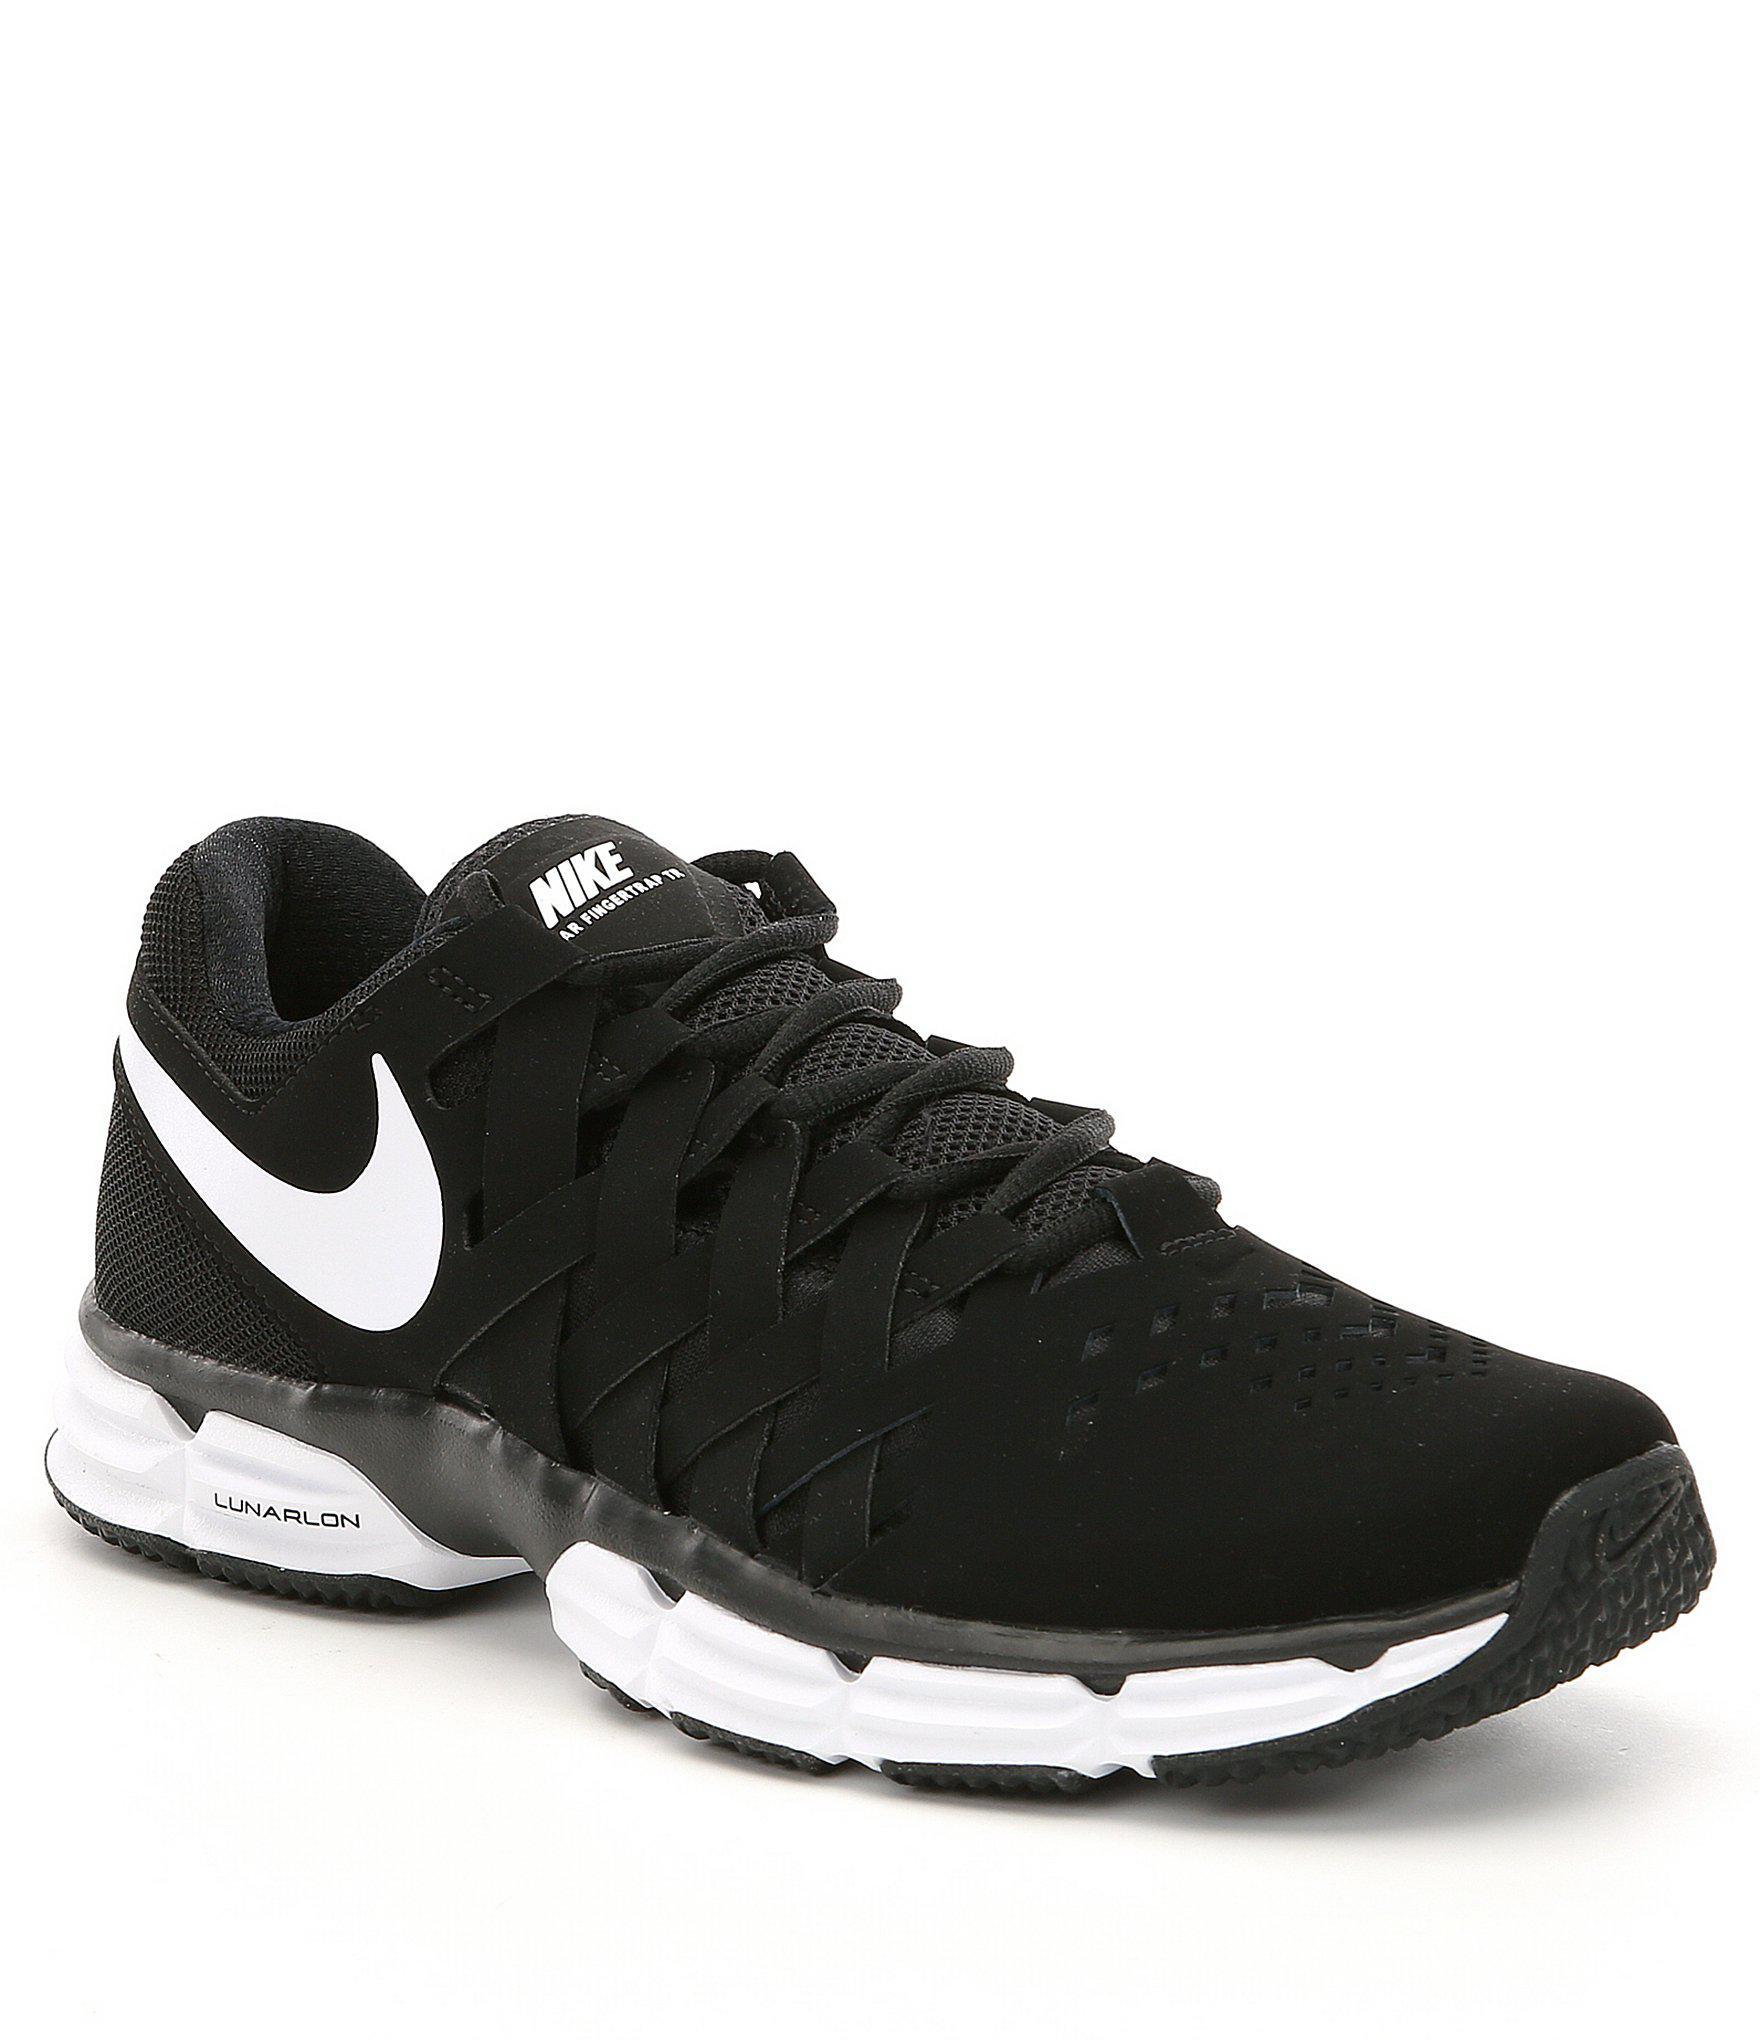 ebb7855ea9 Lyst - Nike Men ́s Lunar Fingertrap Training Shoes in Black for Men